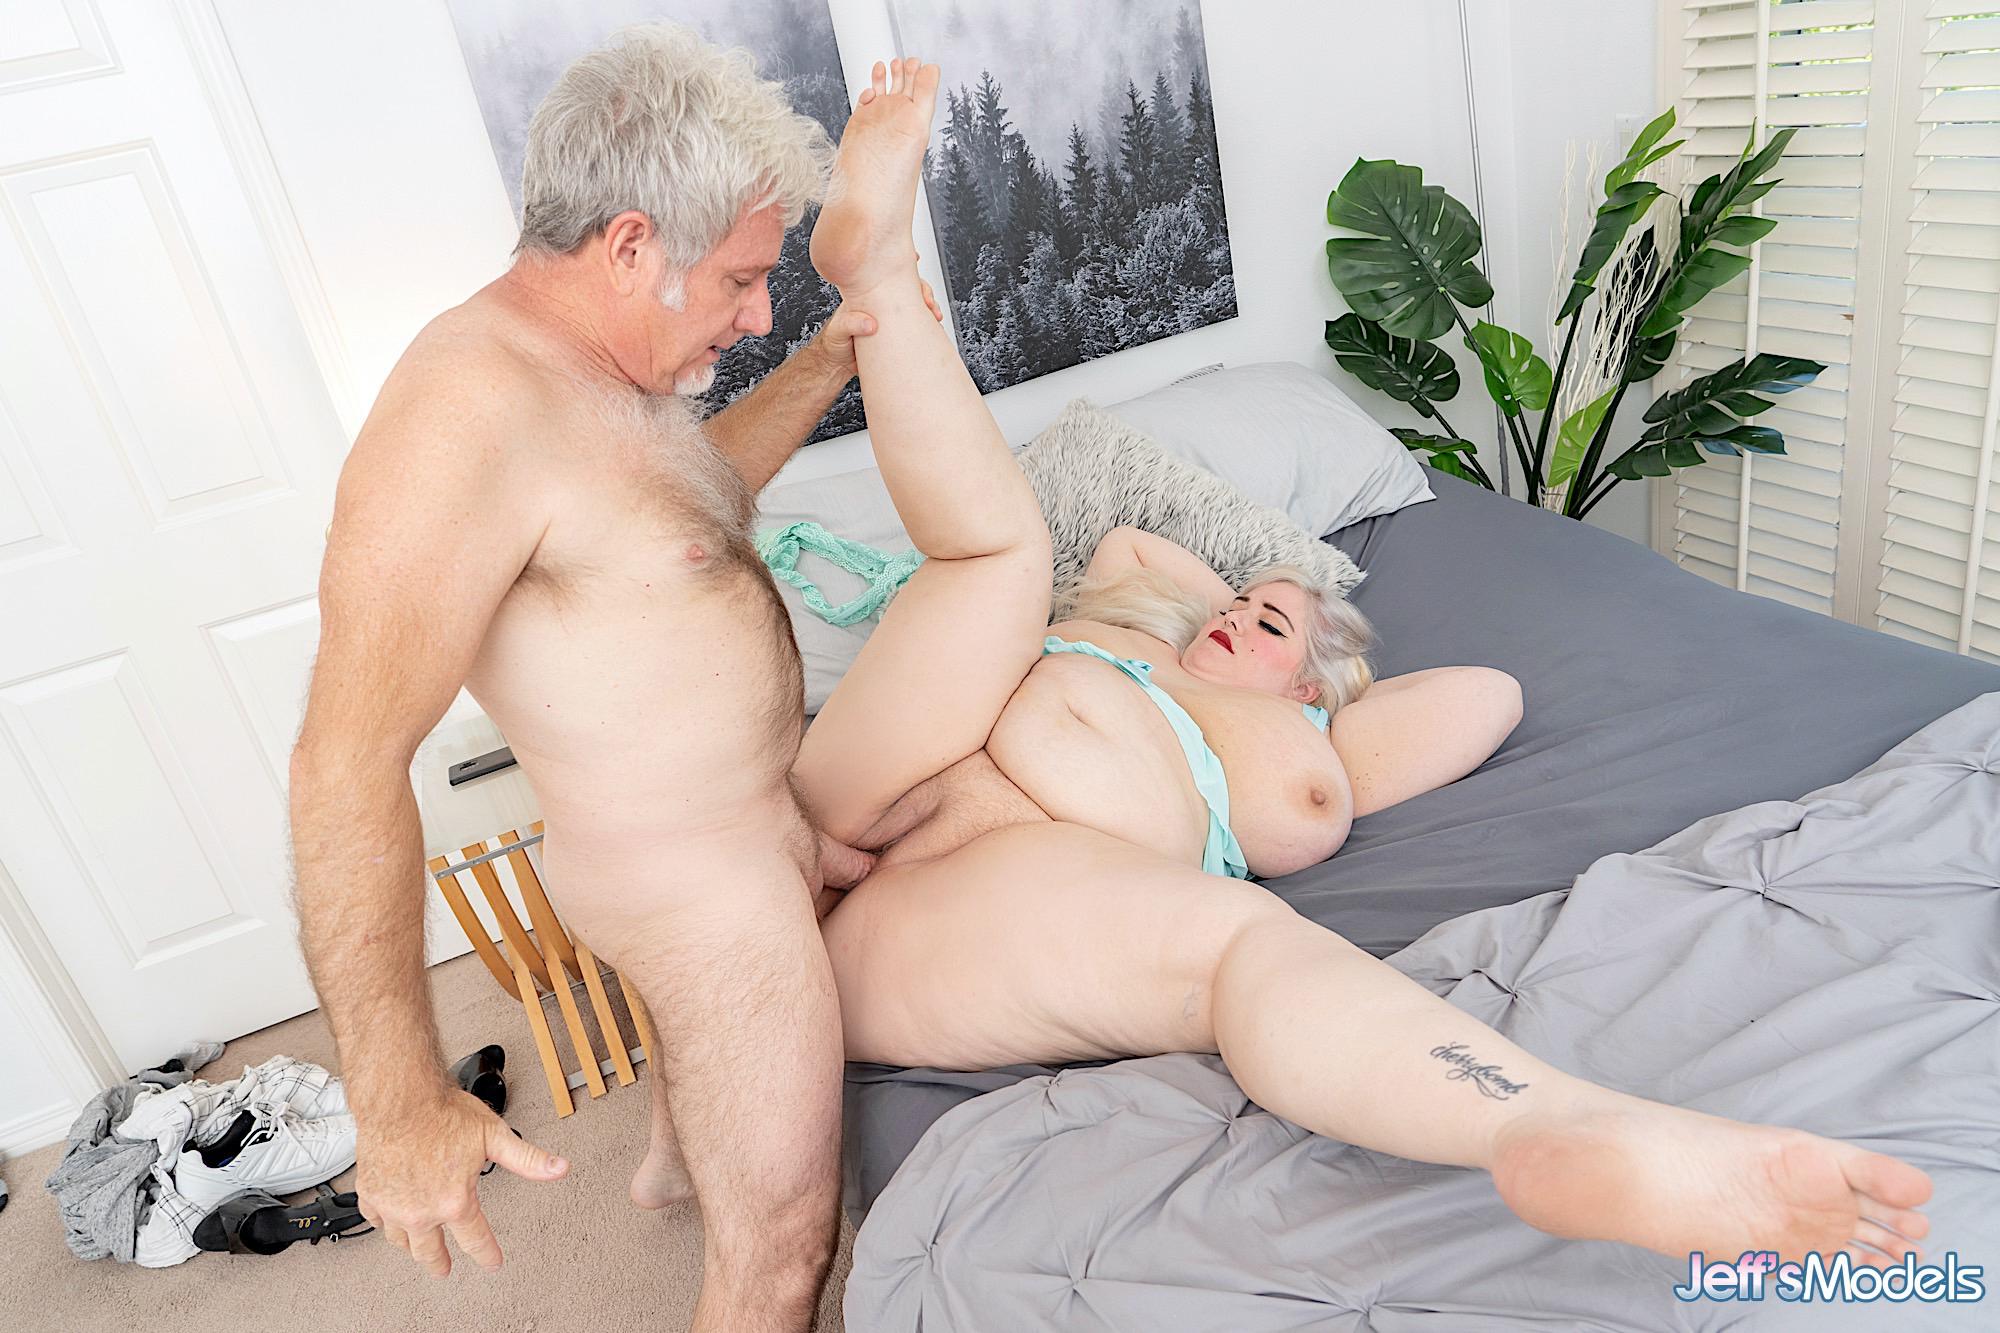 Dicke Frauen. Galerie - 2044. Foto - 7